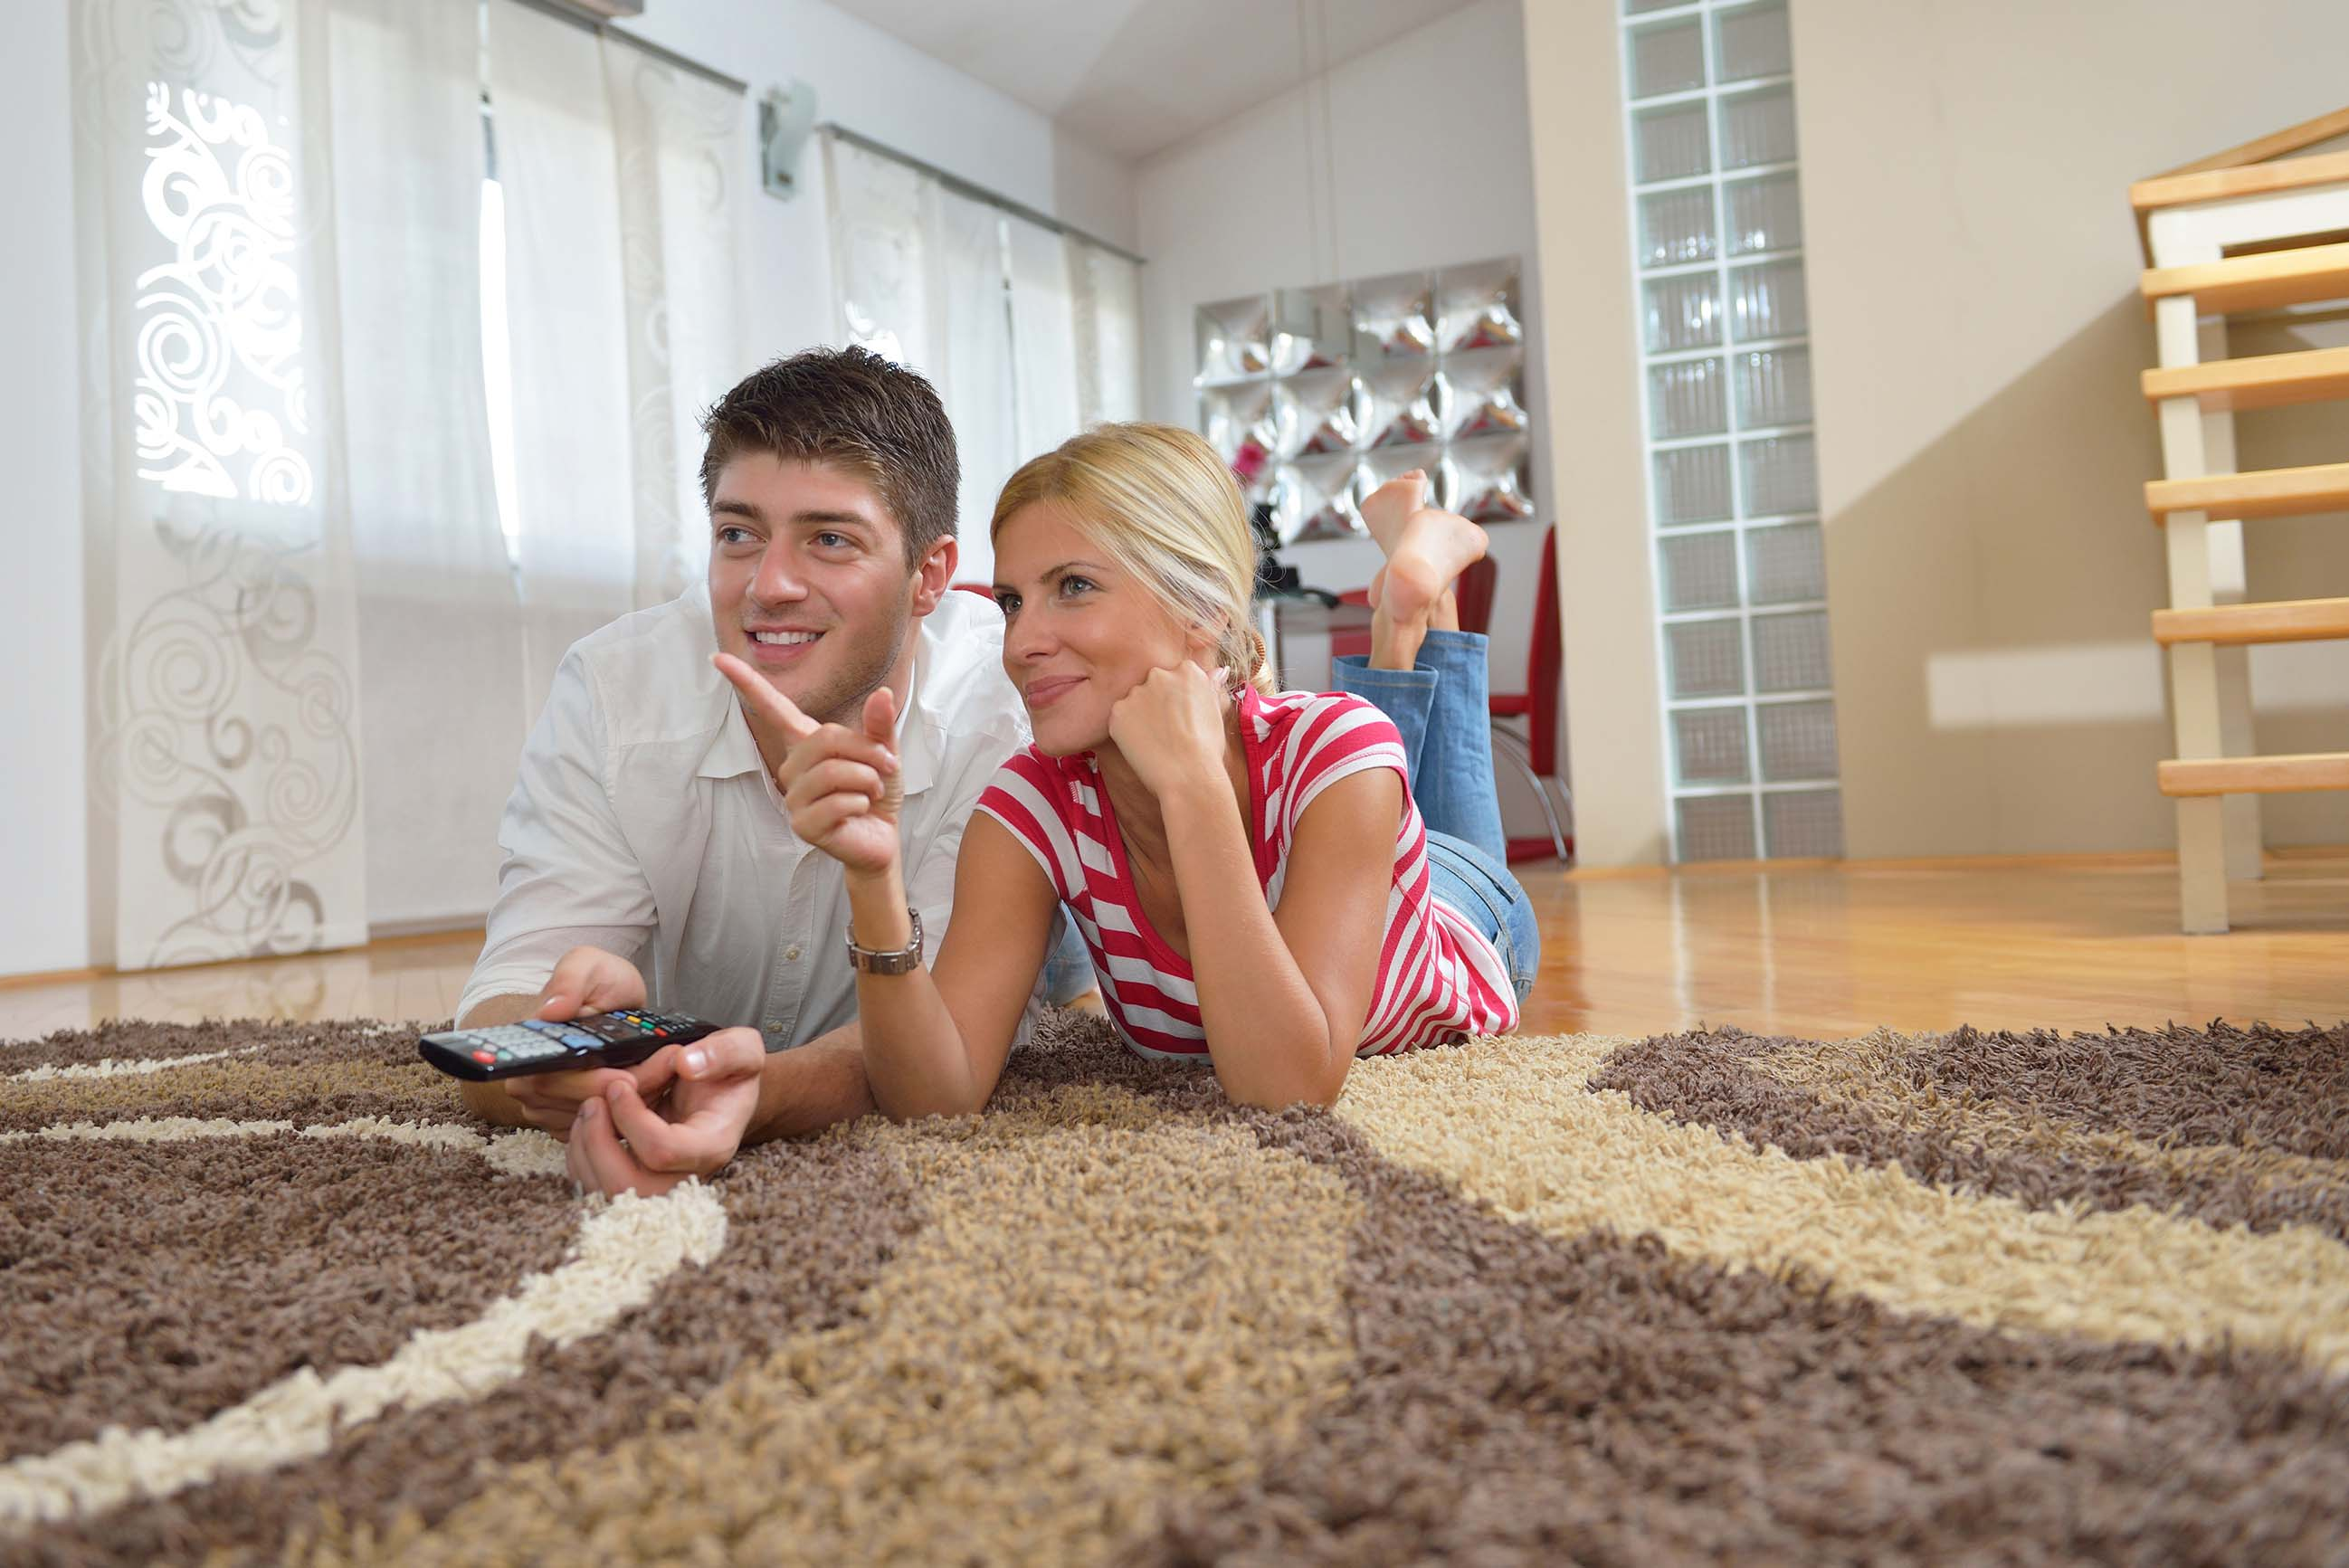 marcus simon versicherungsmakler makler f r limeshain. Black Bedroom Furniture Sets. Home Design Ideas